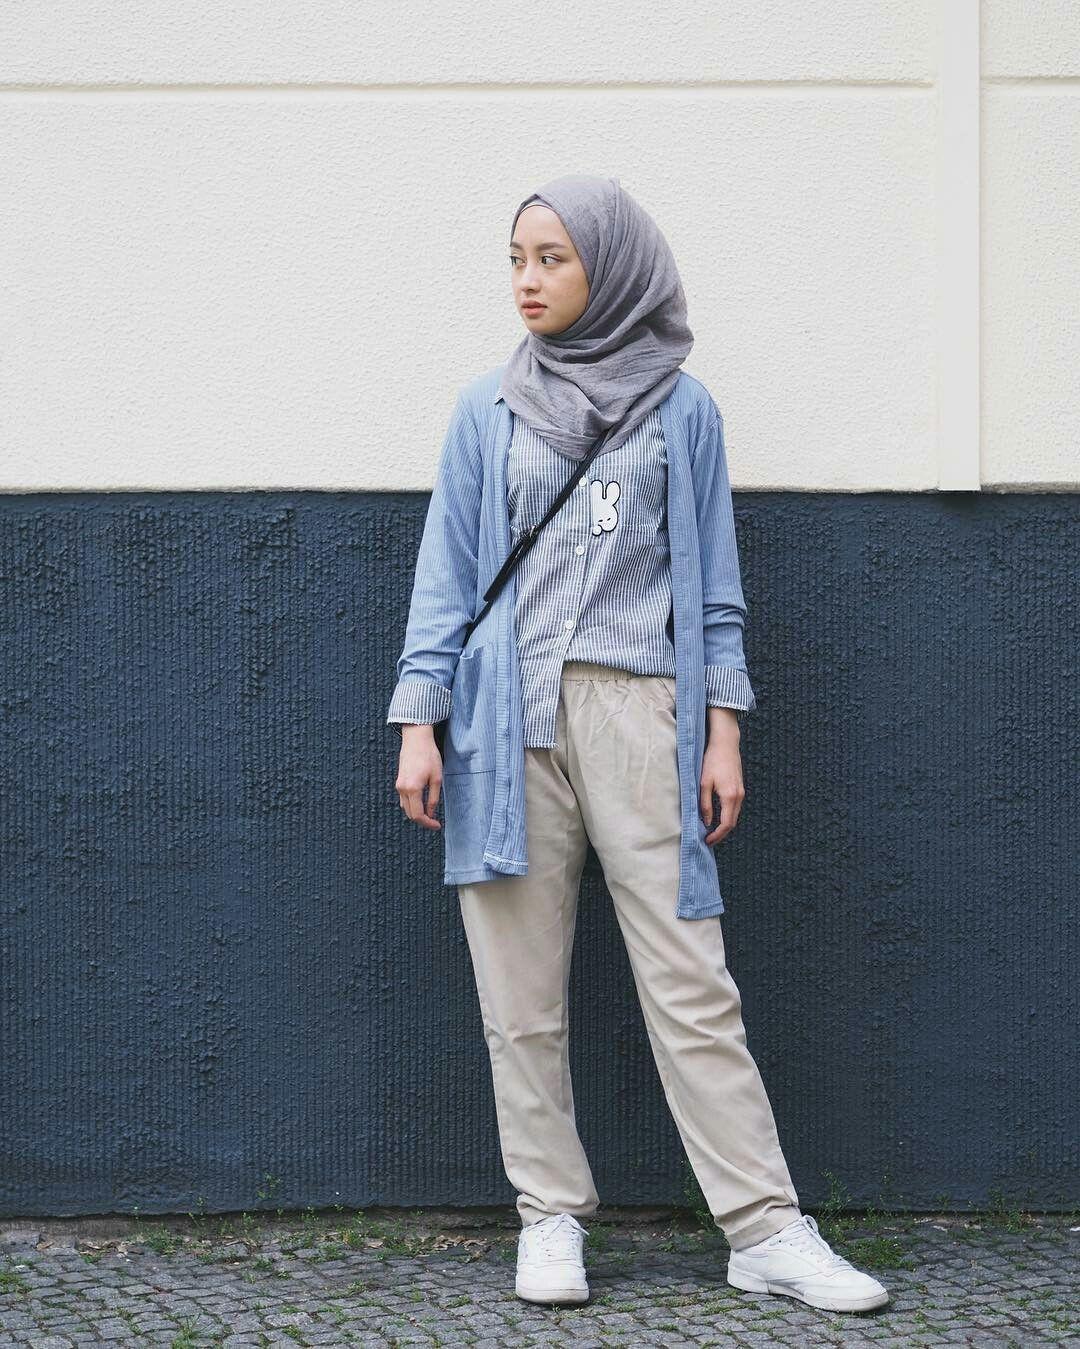 foto style baju hijab simple foto candid kekinian